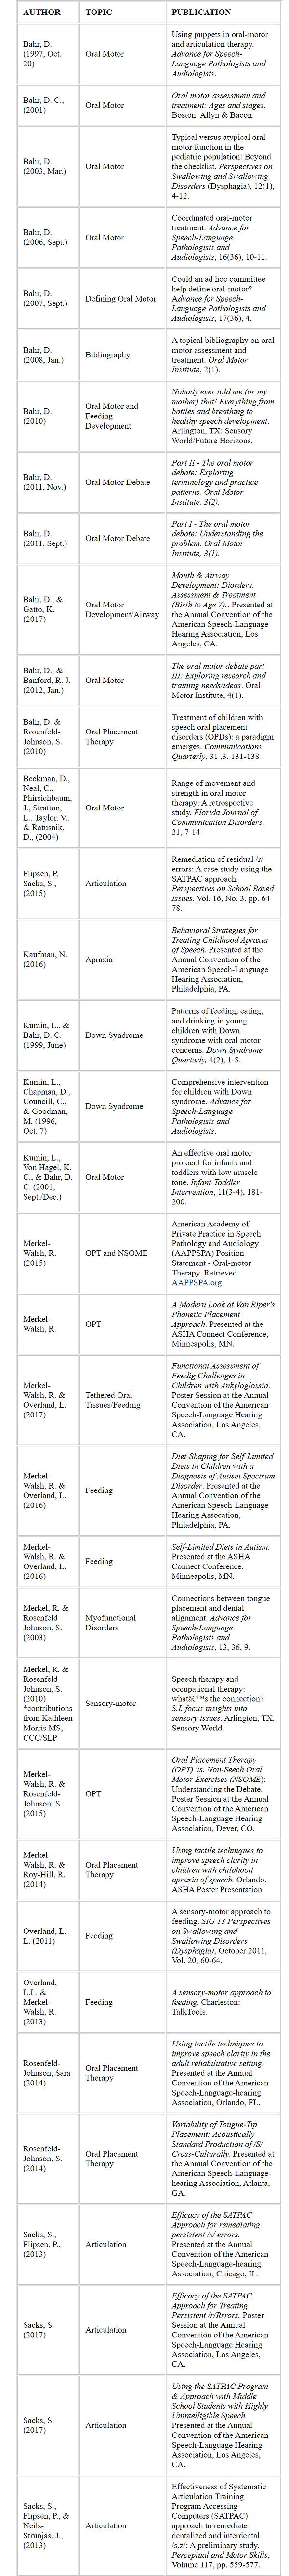 EBP-Articles-table.png